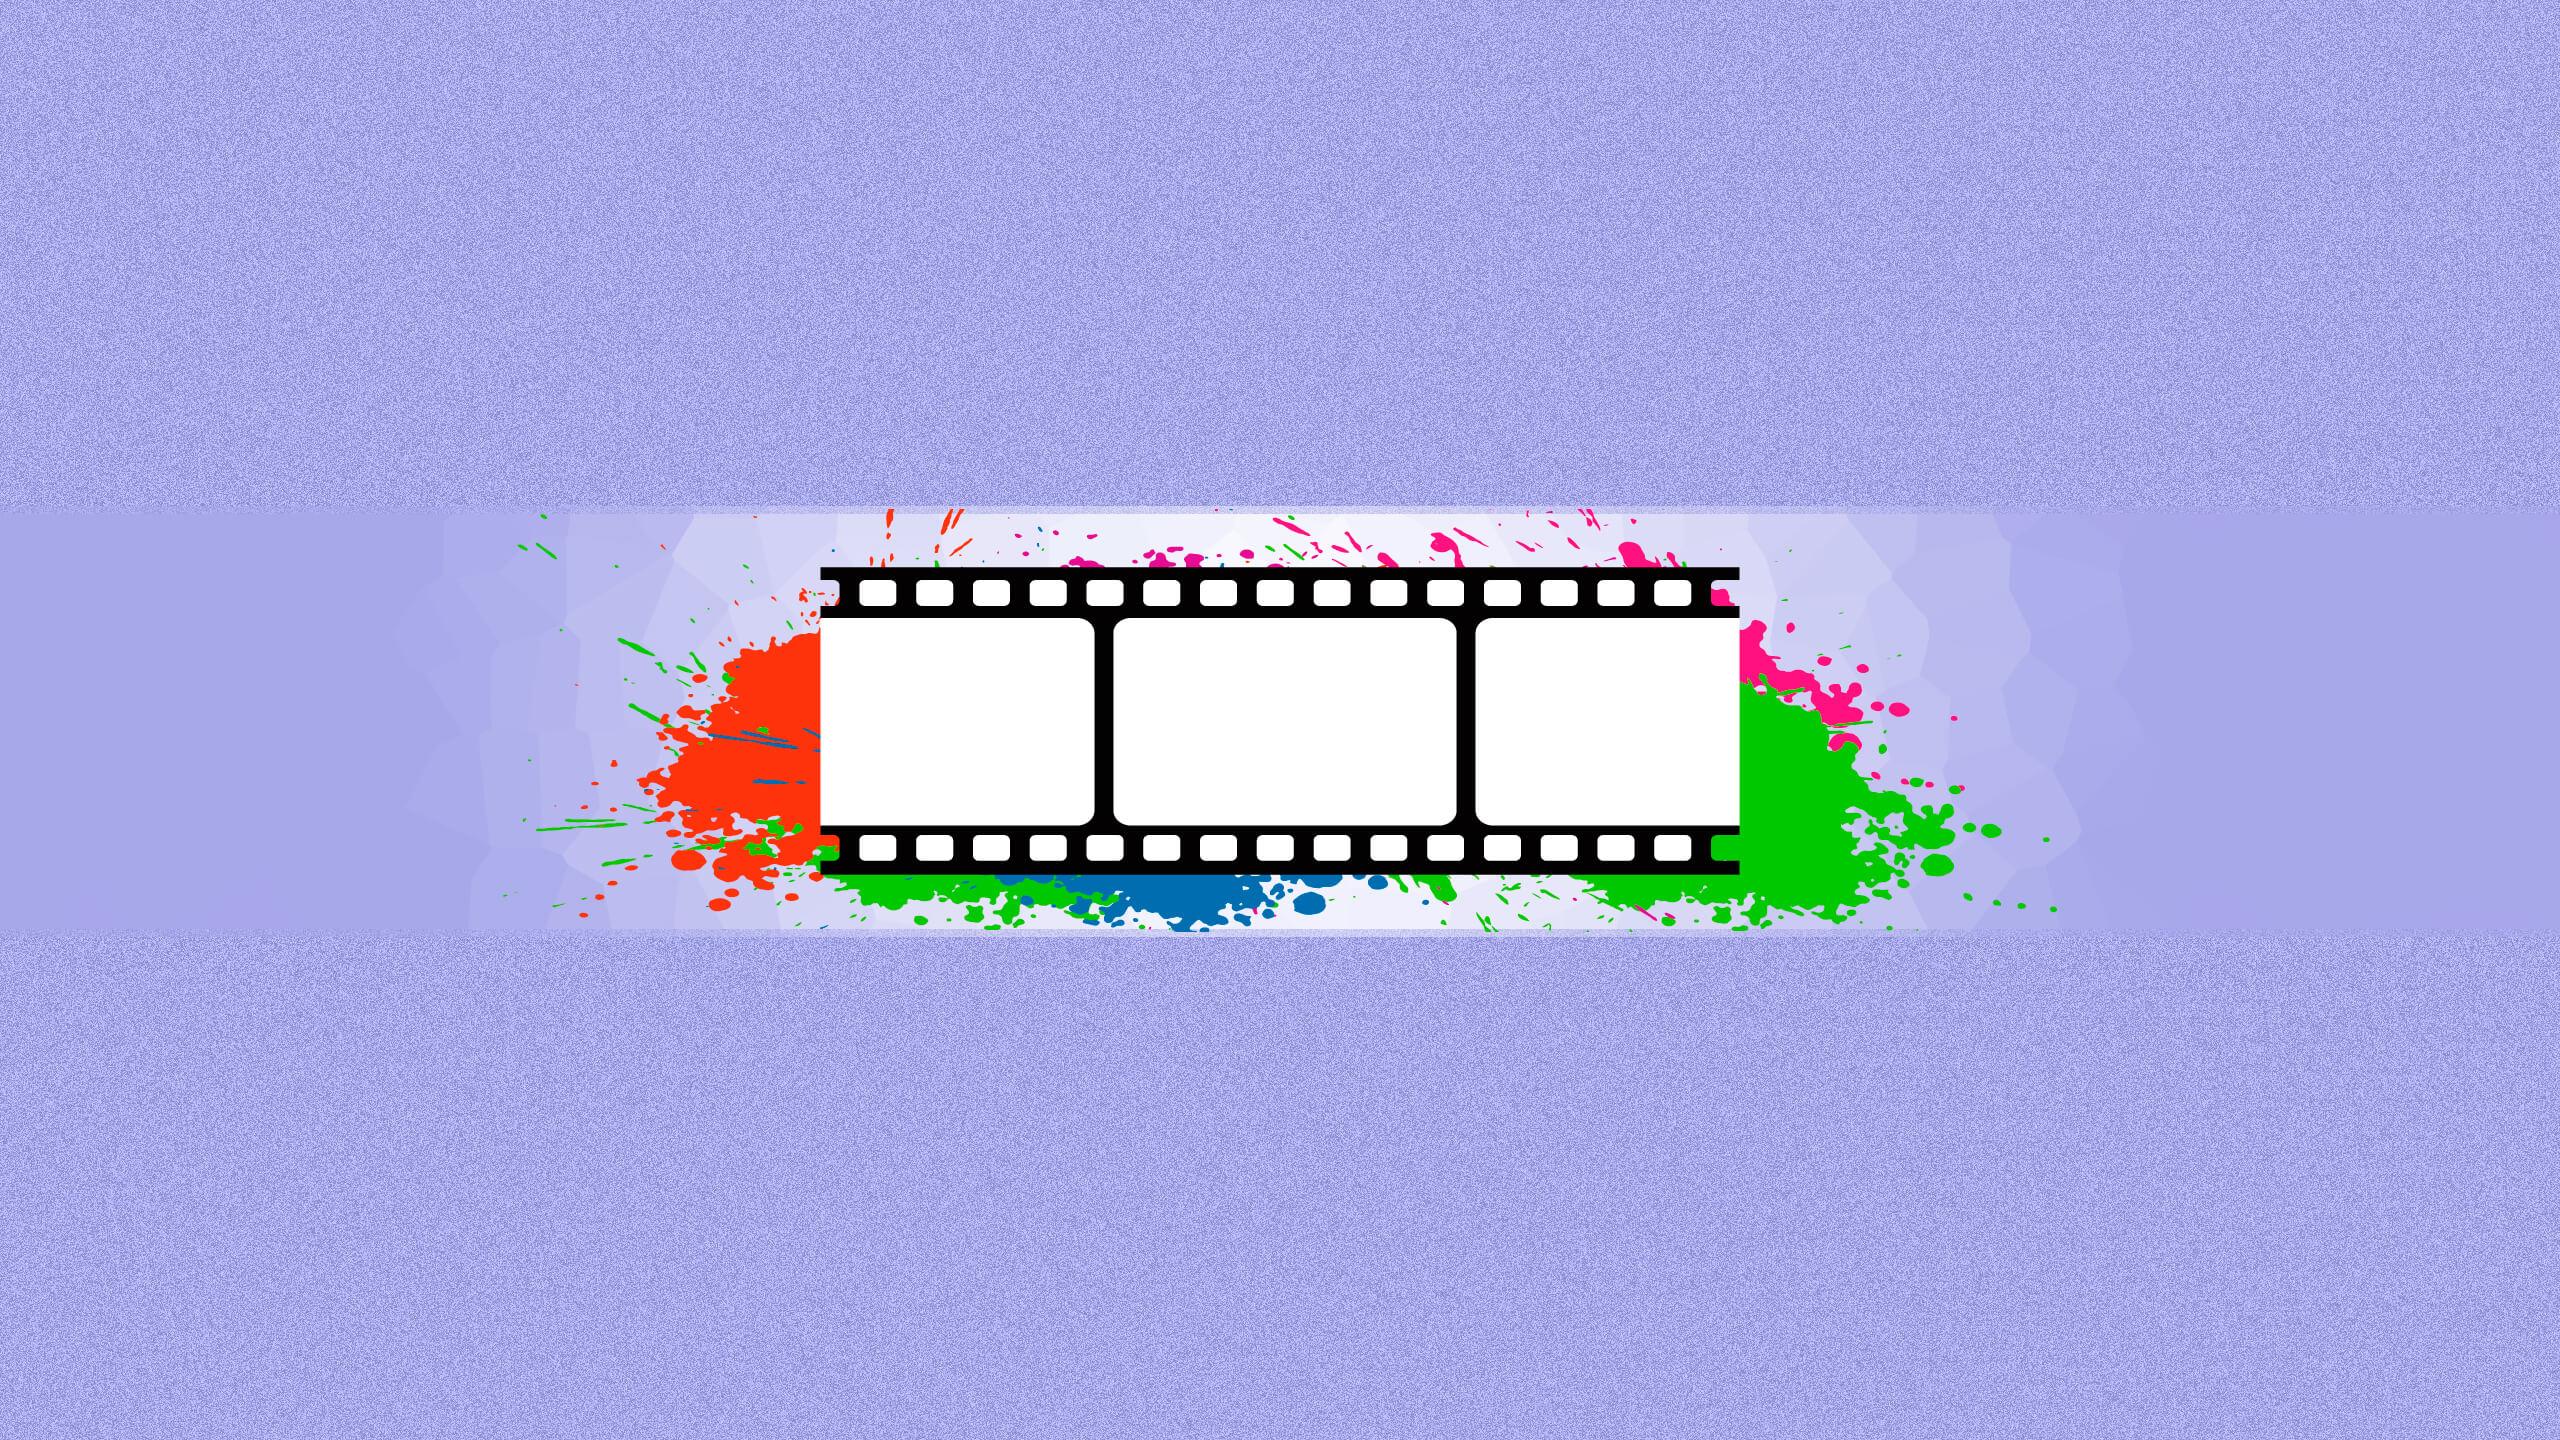 Картинка киноплёнки на баннер для ютуба